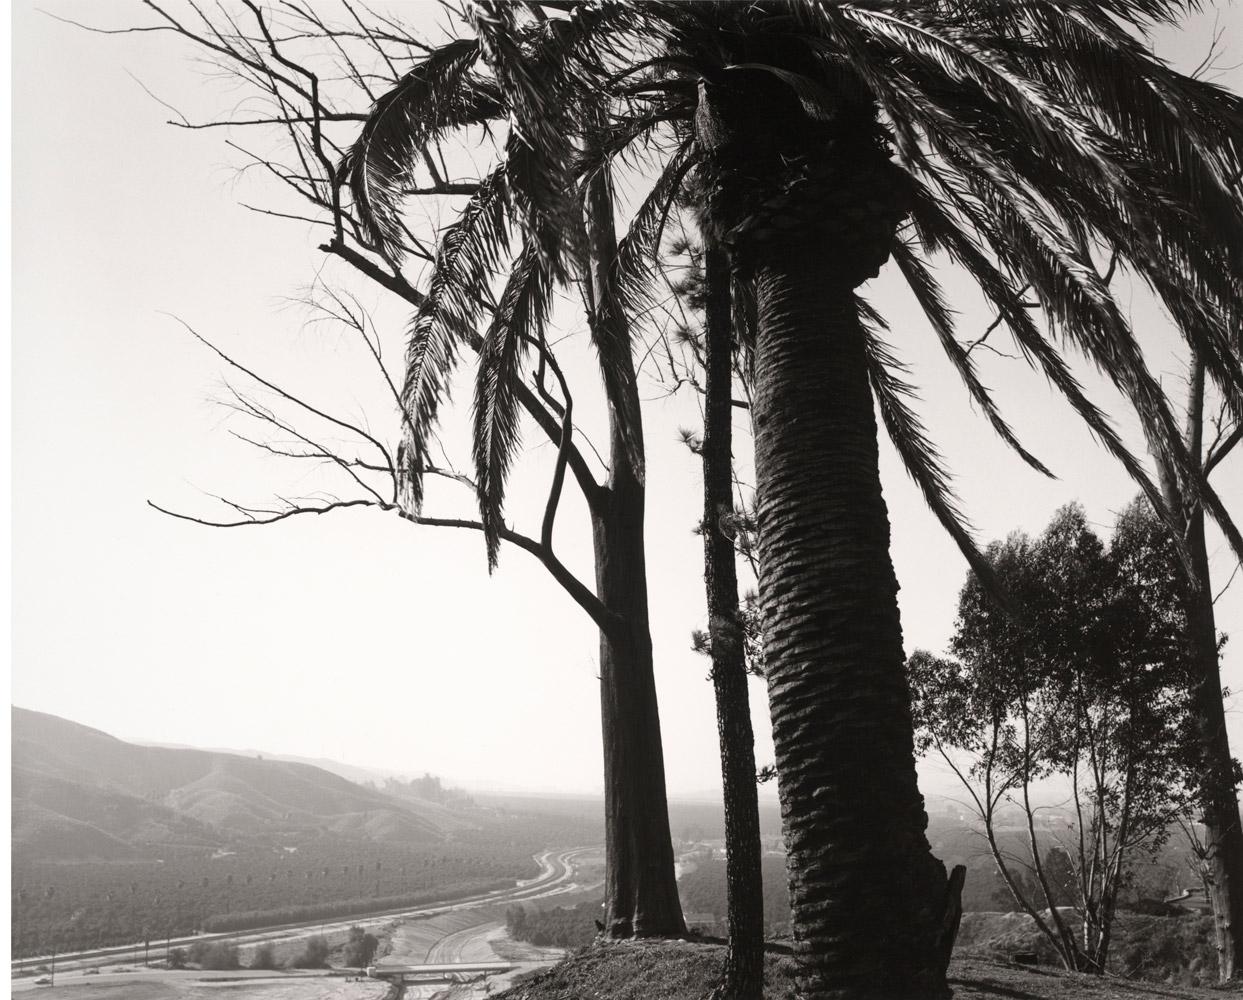 Edge of San Timoteo Canyon, looking towards Los Angeles, Redlands, California, 1978